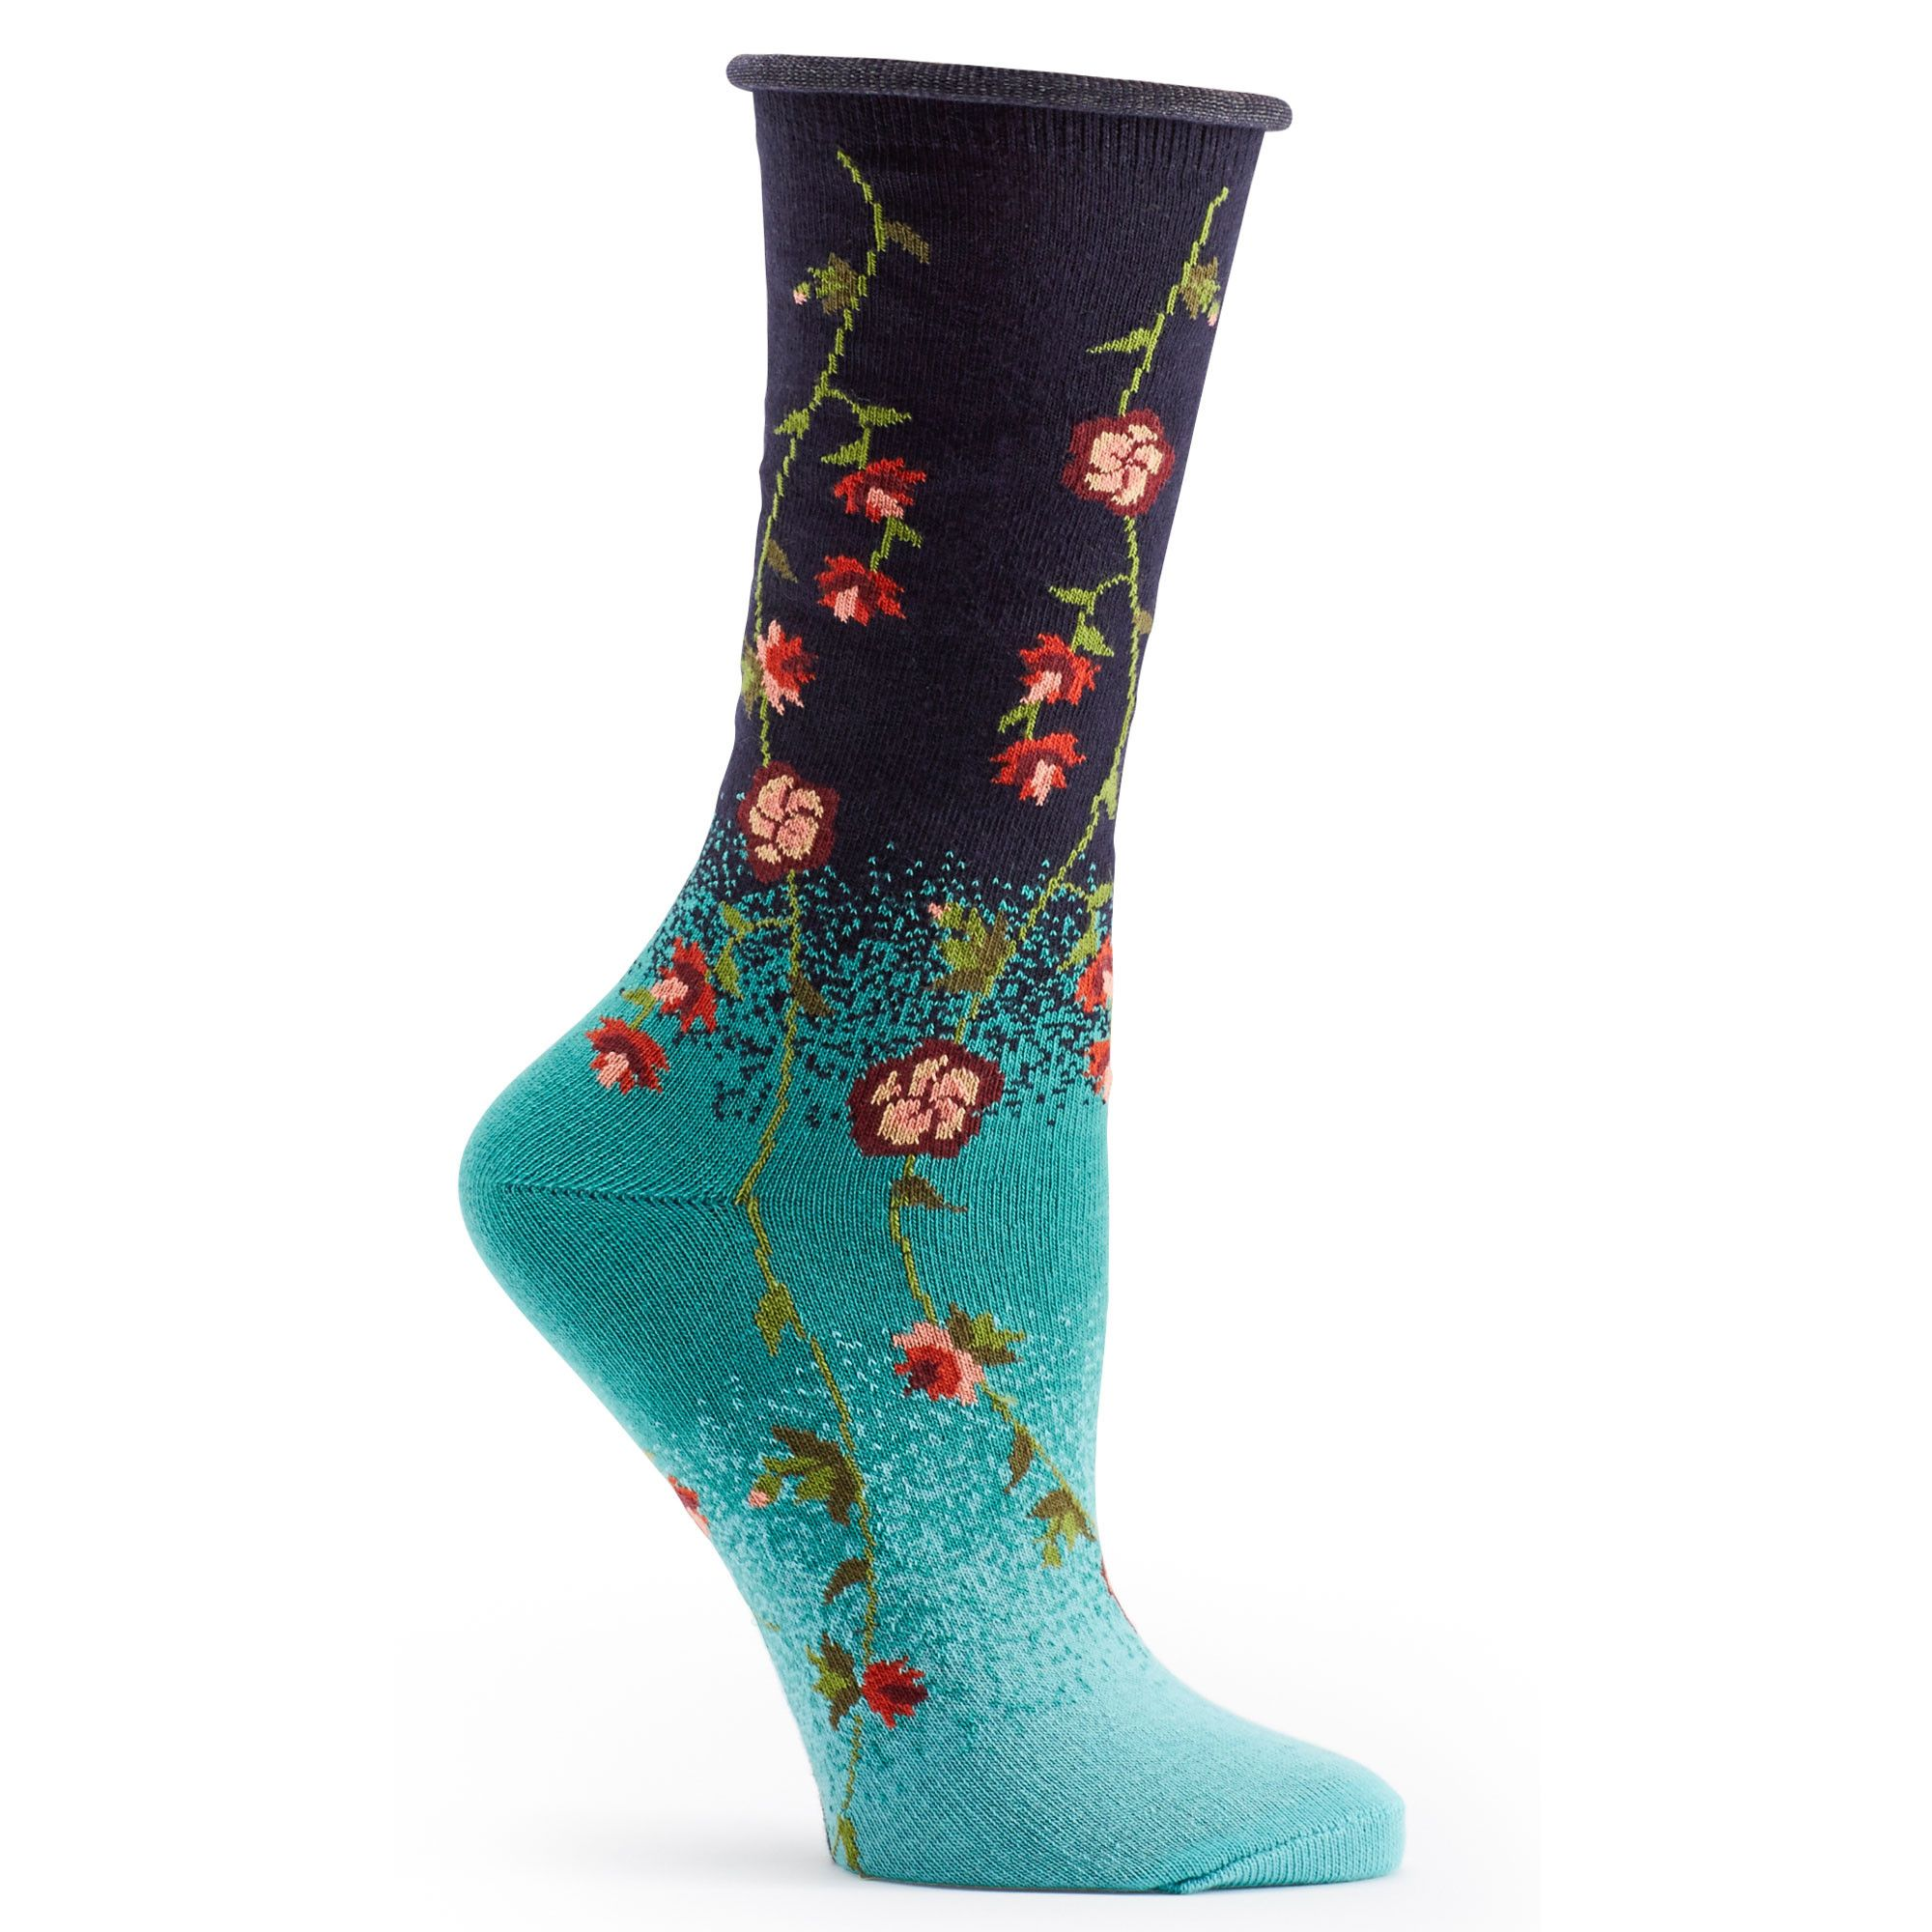 2923976518dbf Ozone Socks Tibetan Flowers Sock - Assorted Colors - Free Shipping!